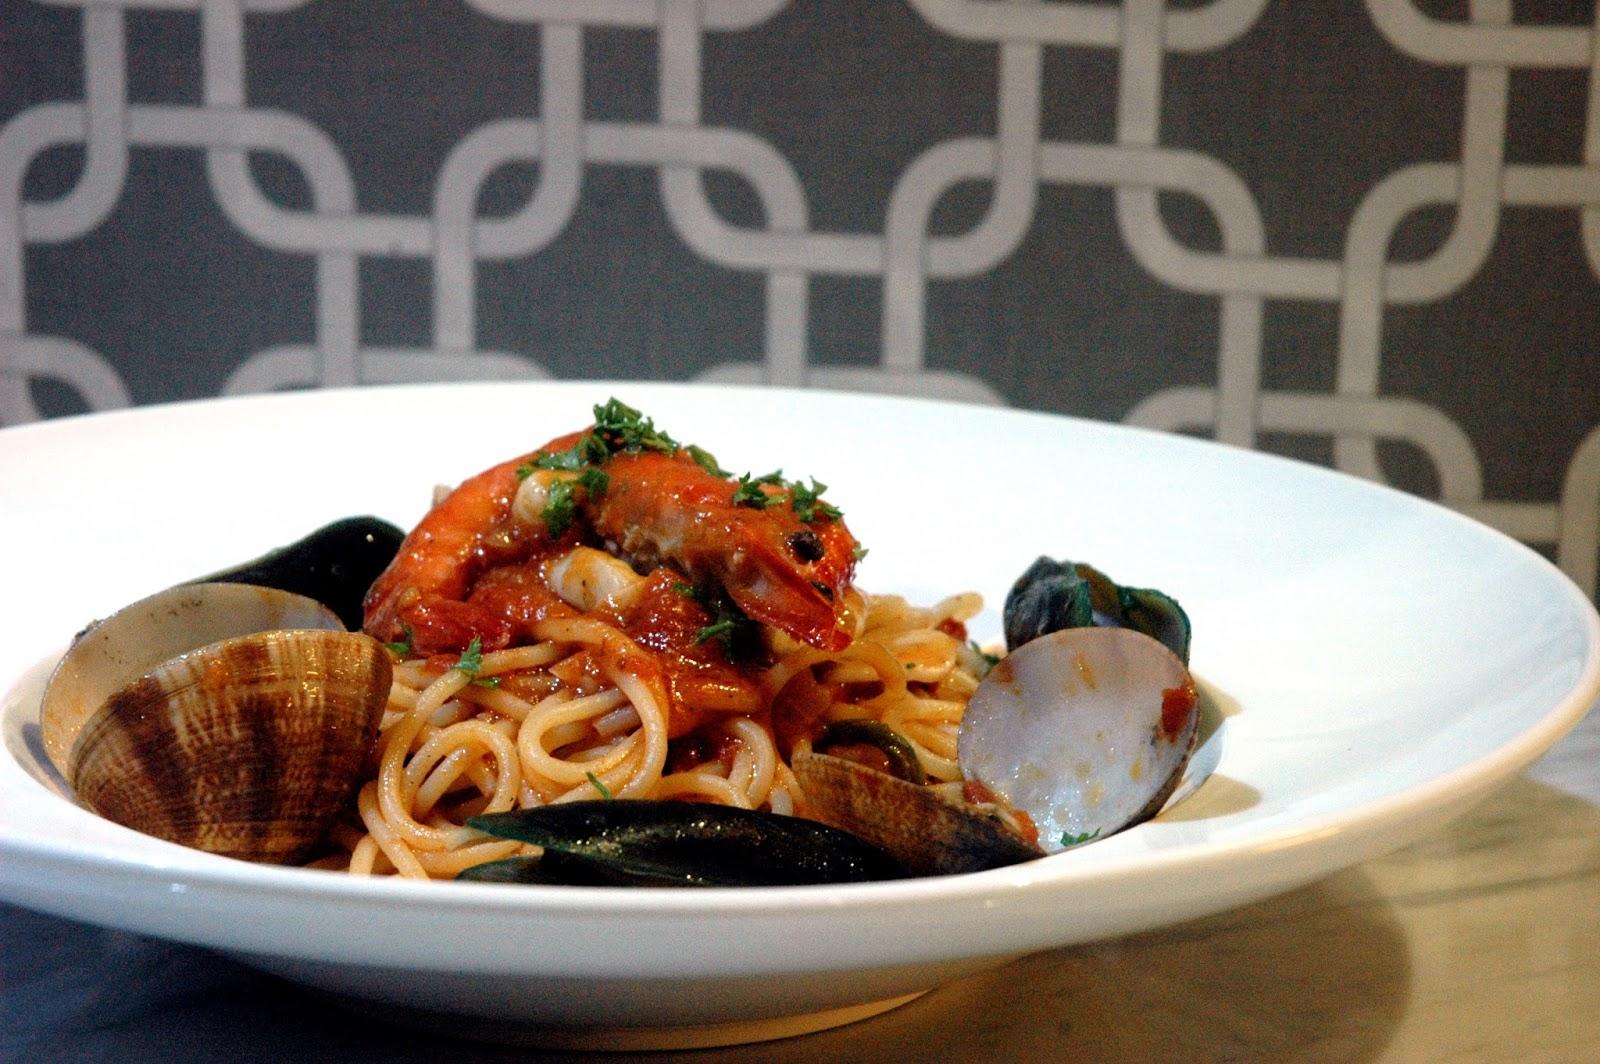 Dude for food authentic italian cuisine at lucia ristorante for Authentic italian cuisine